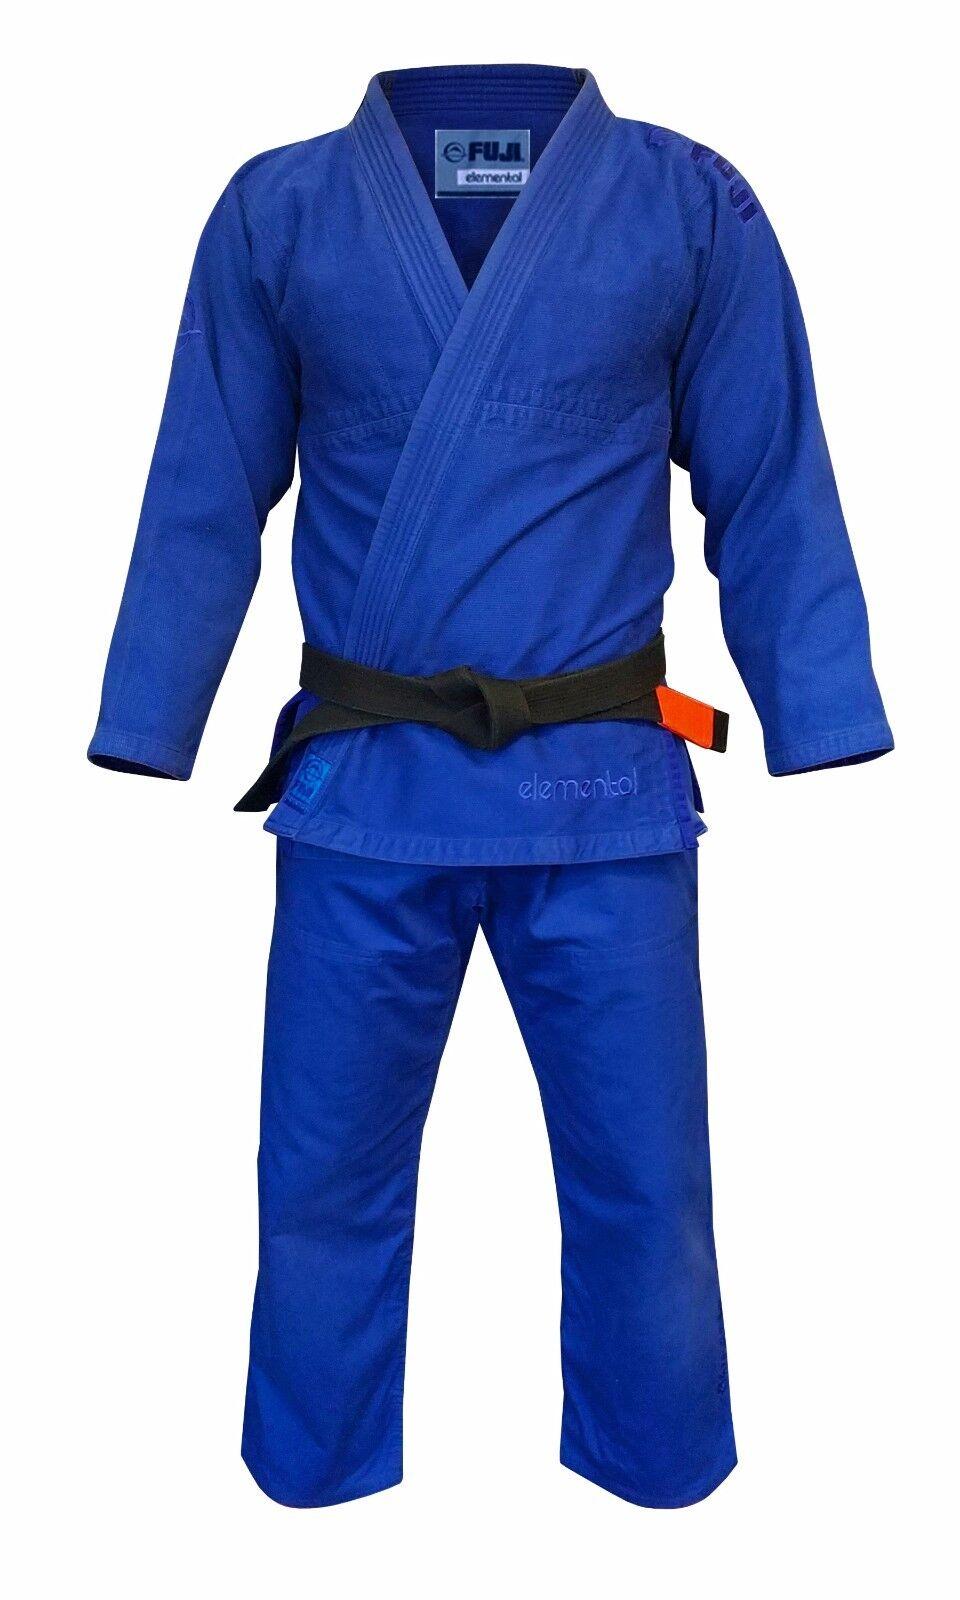 New Fuji Sports Elemental Mens Brazilian Jiu Jitsu Gi Jiu-Jitsu BJJ - blueee